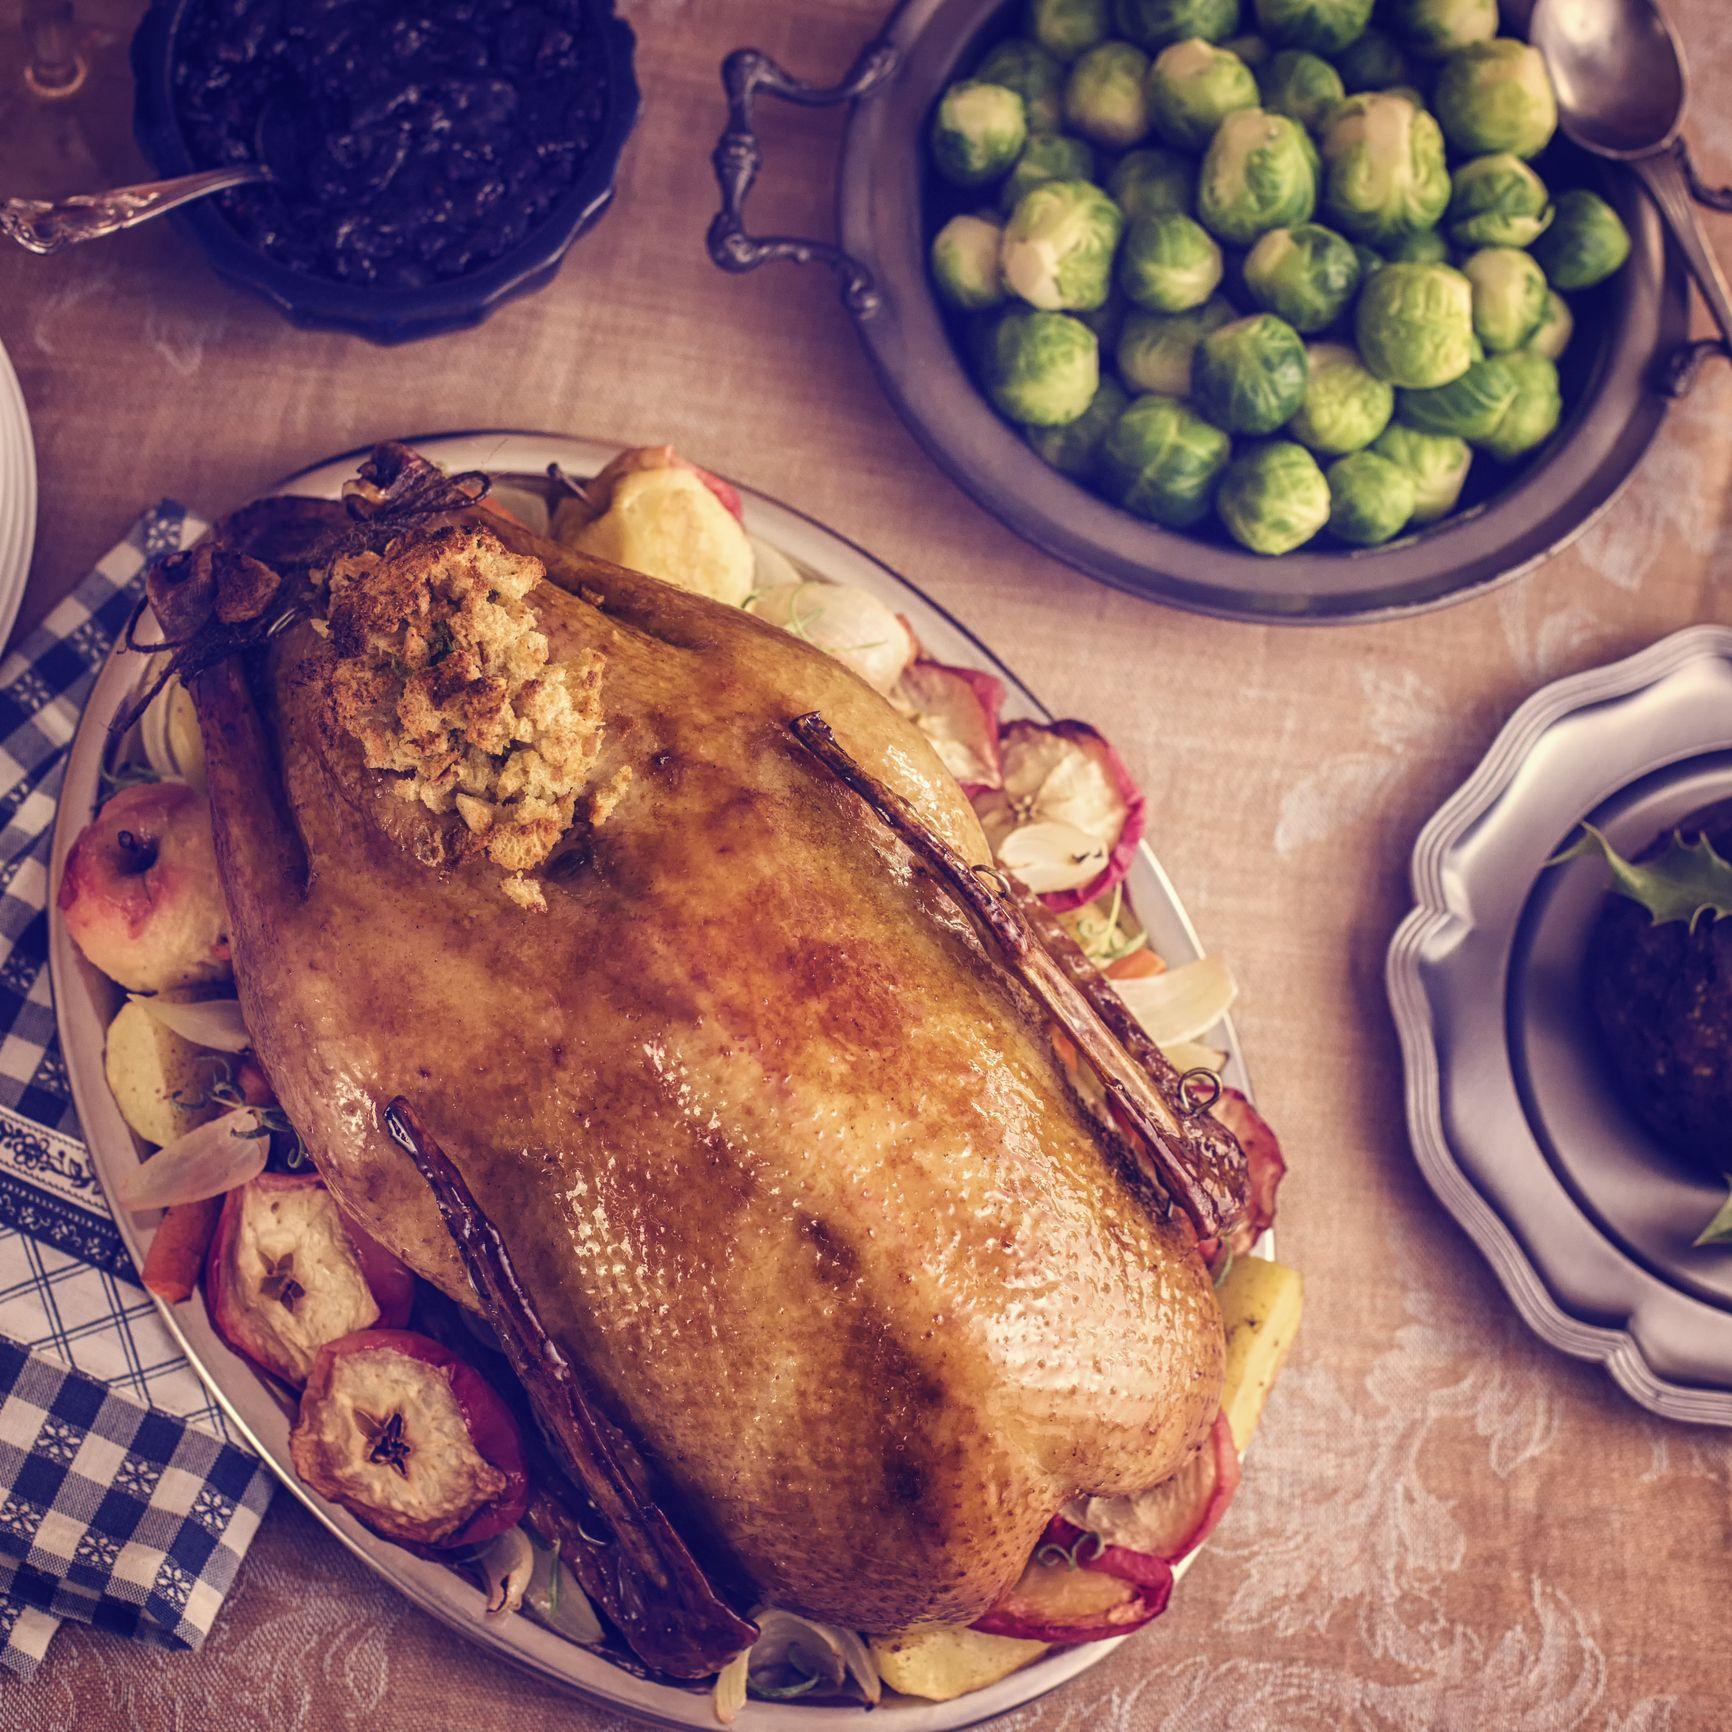 John Torode's turkey with caramelised onions